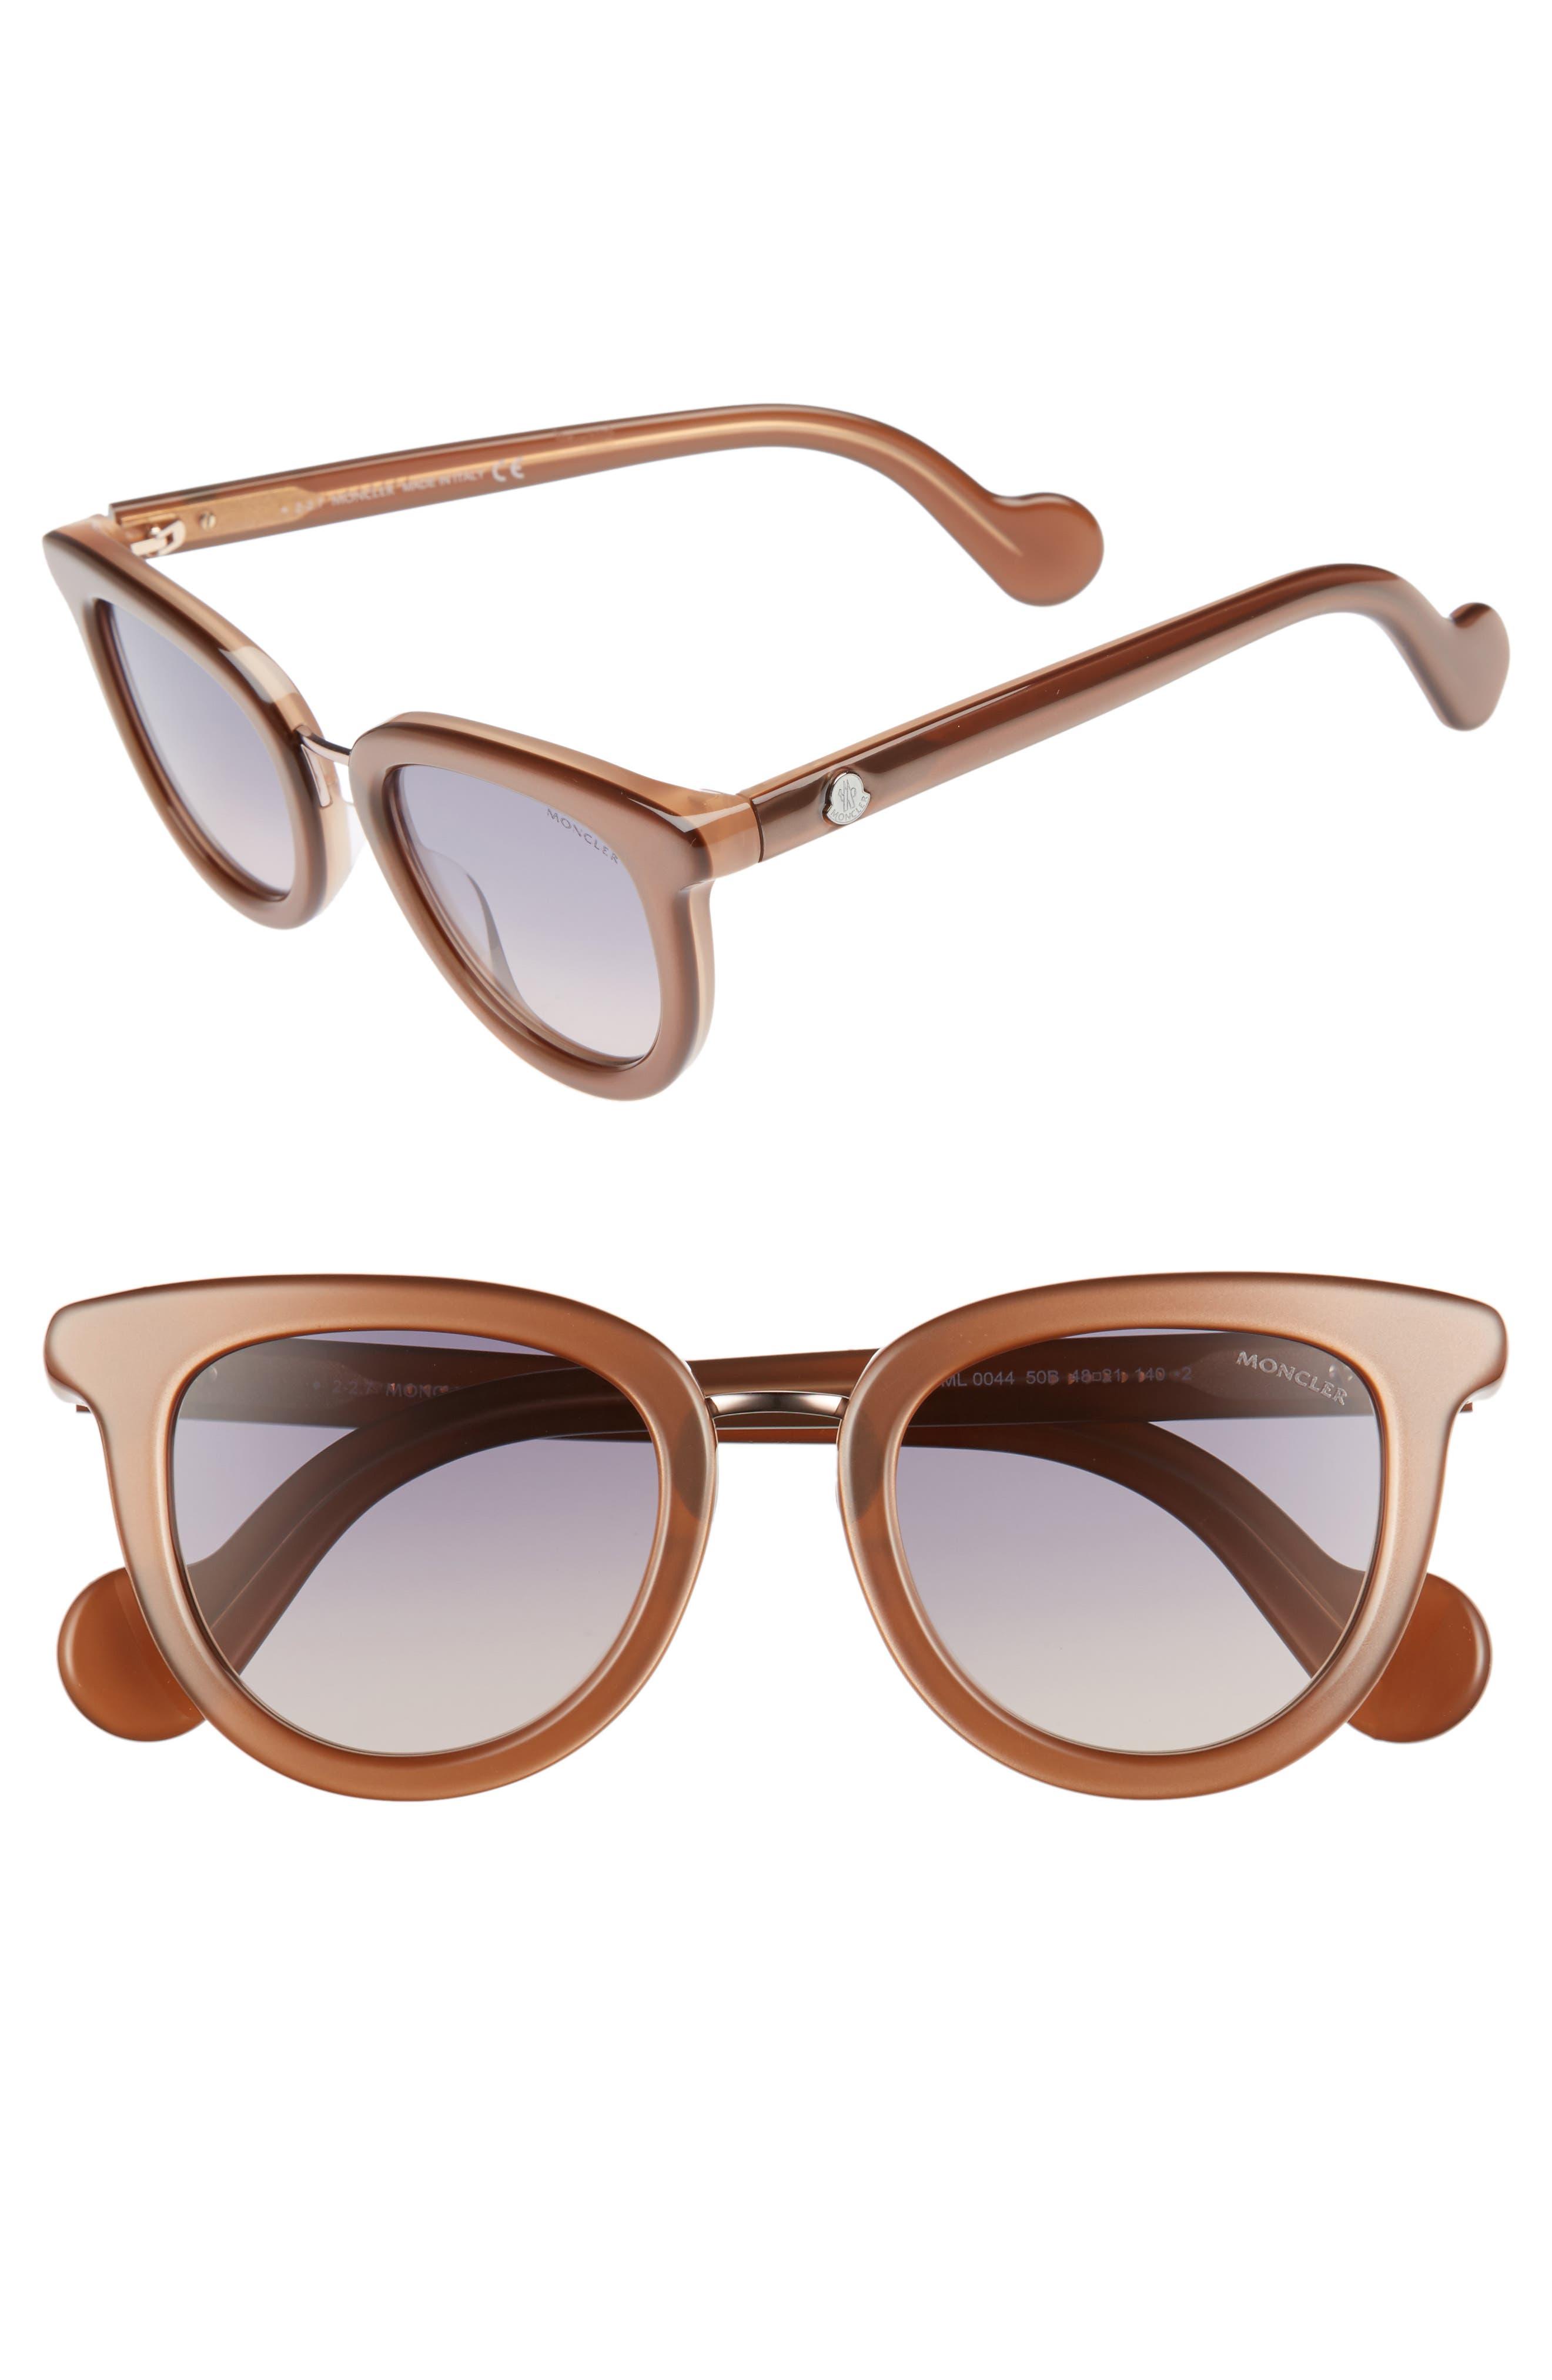 48mm Cat Eye Sunglasses,                         Main,                         color, Pearl Brown/ Grey/ Sand